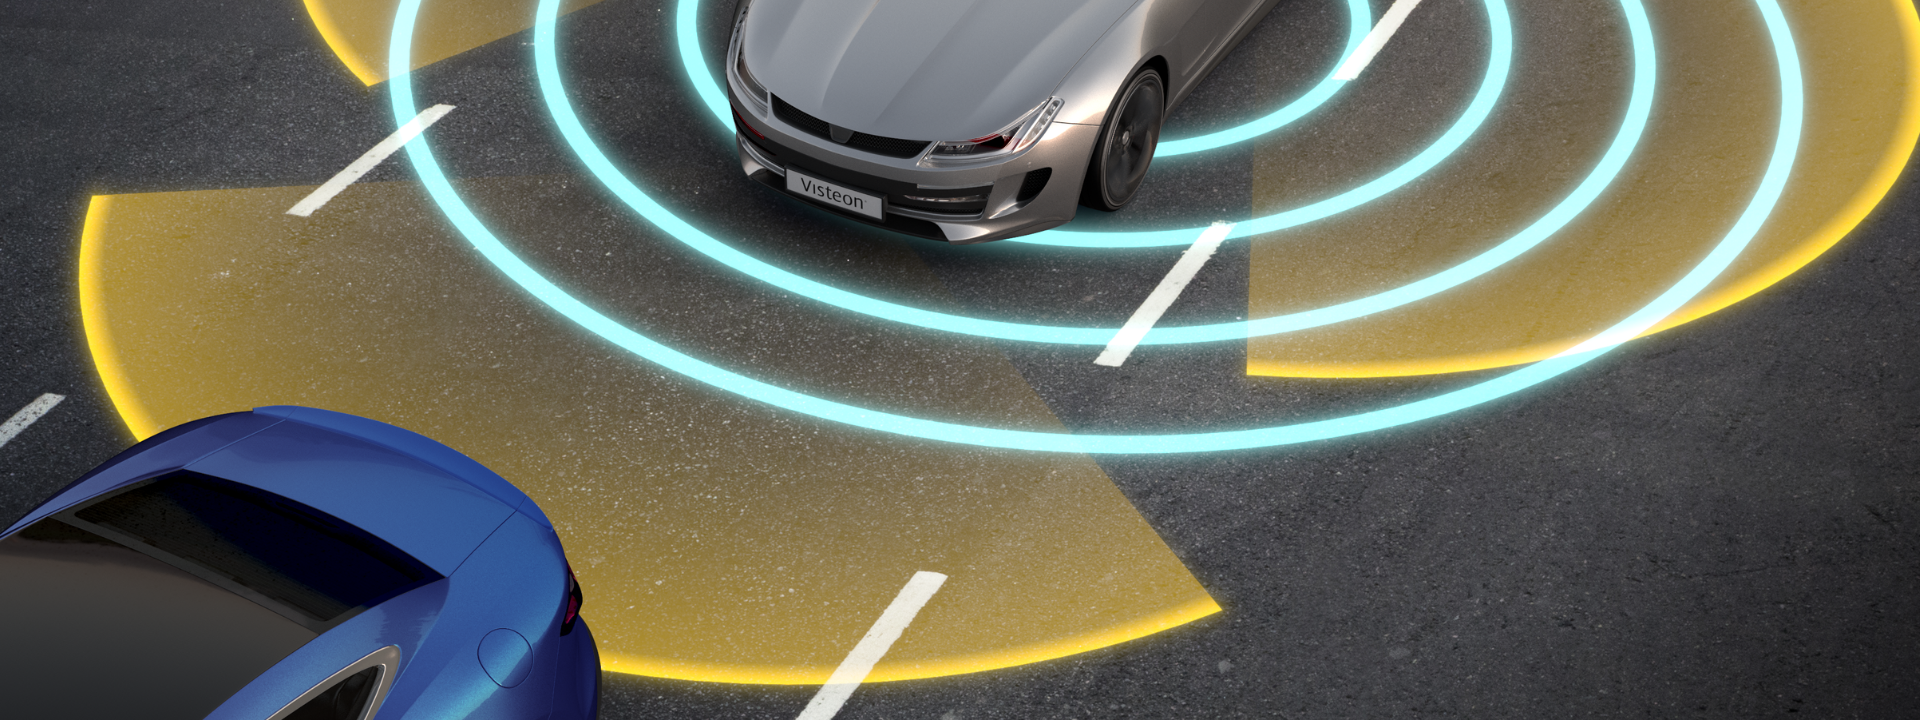 visteon-technology-header-image-car-sensing-surroundings-on-road